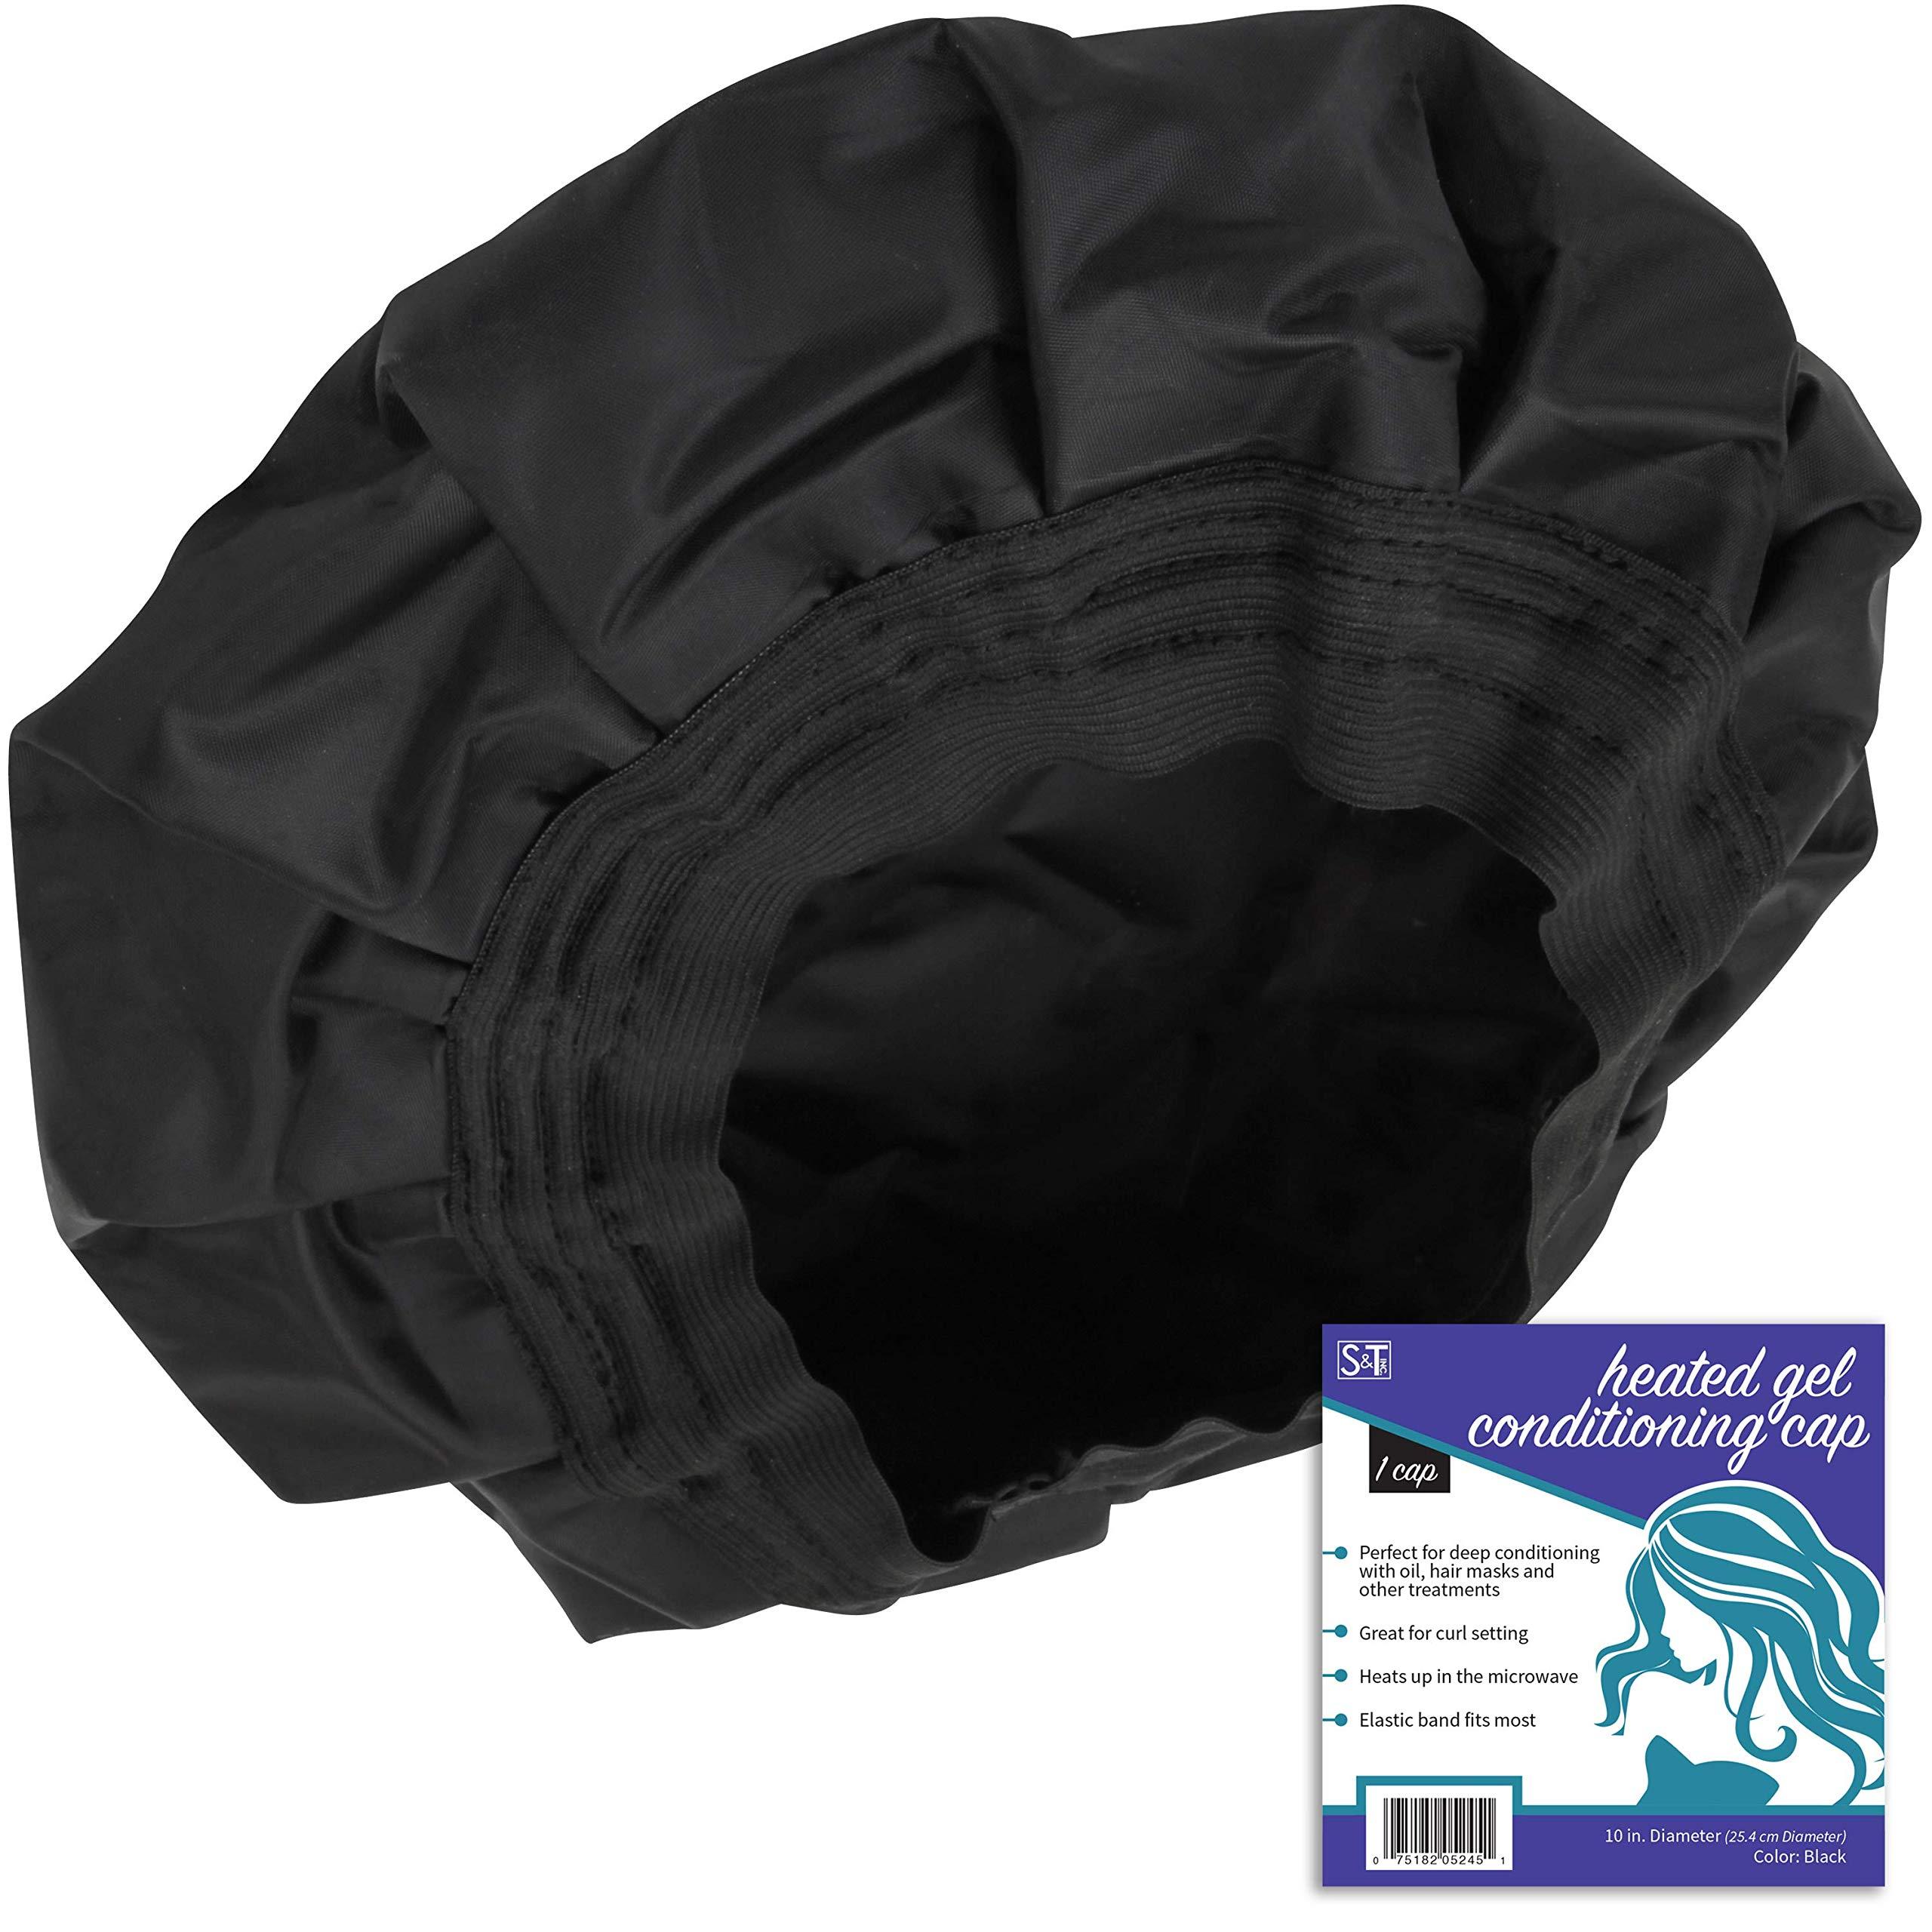 S & T 524501 Cordless Heated Deep Conditioning Cap Black